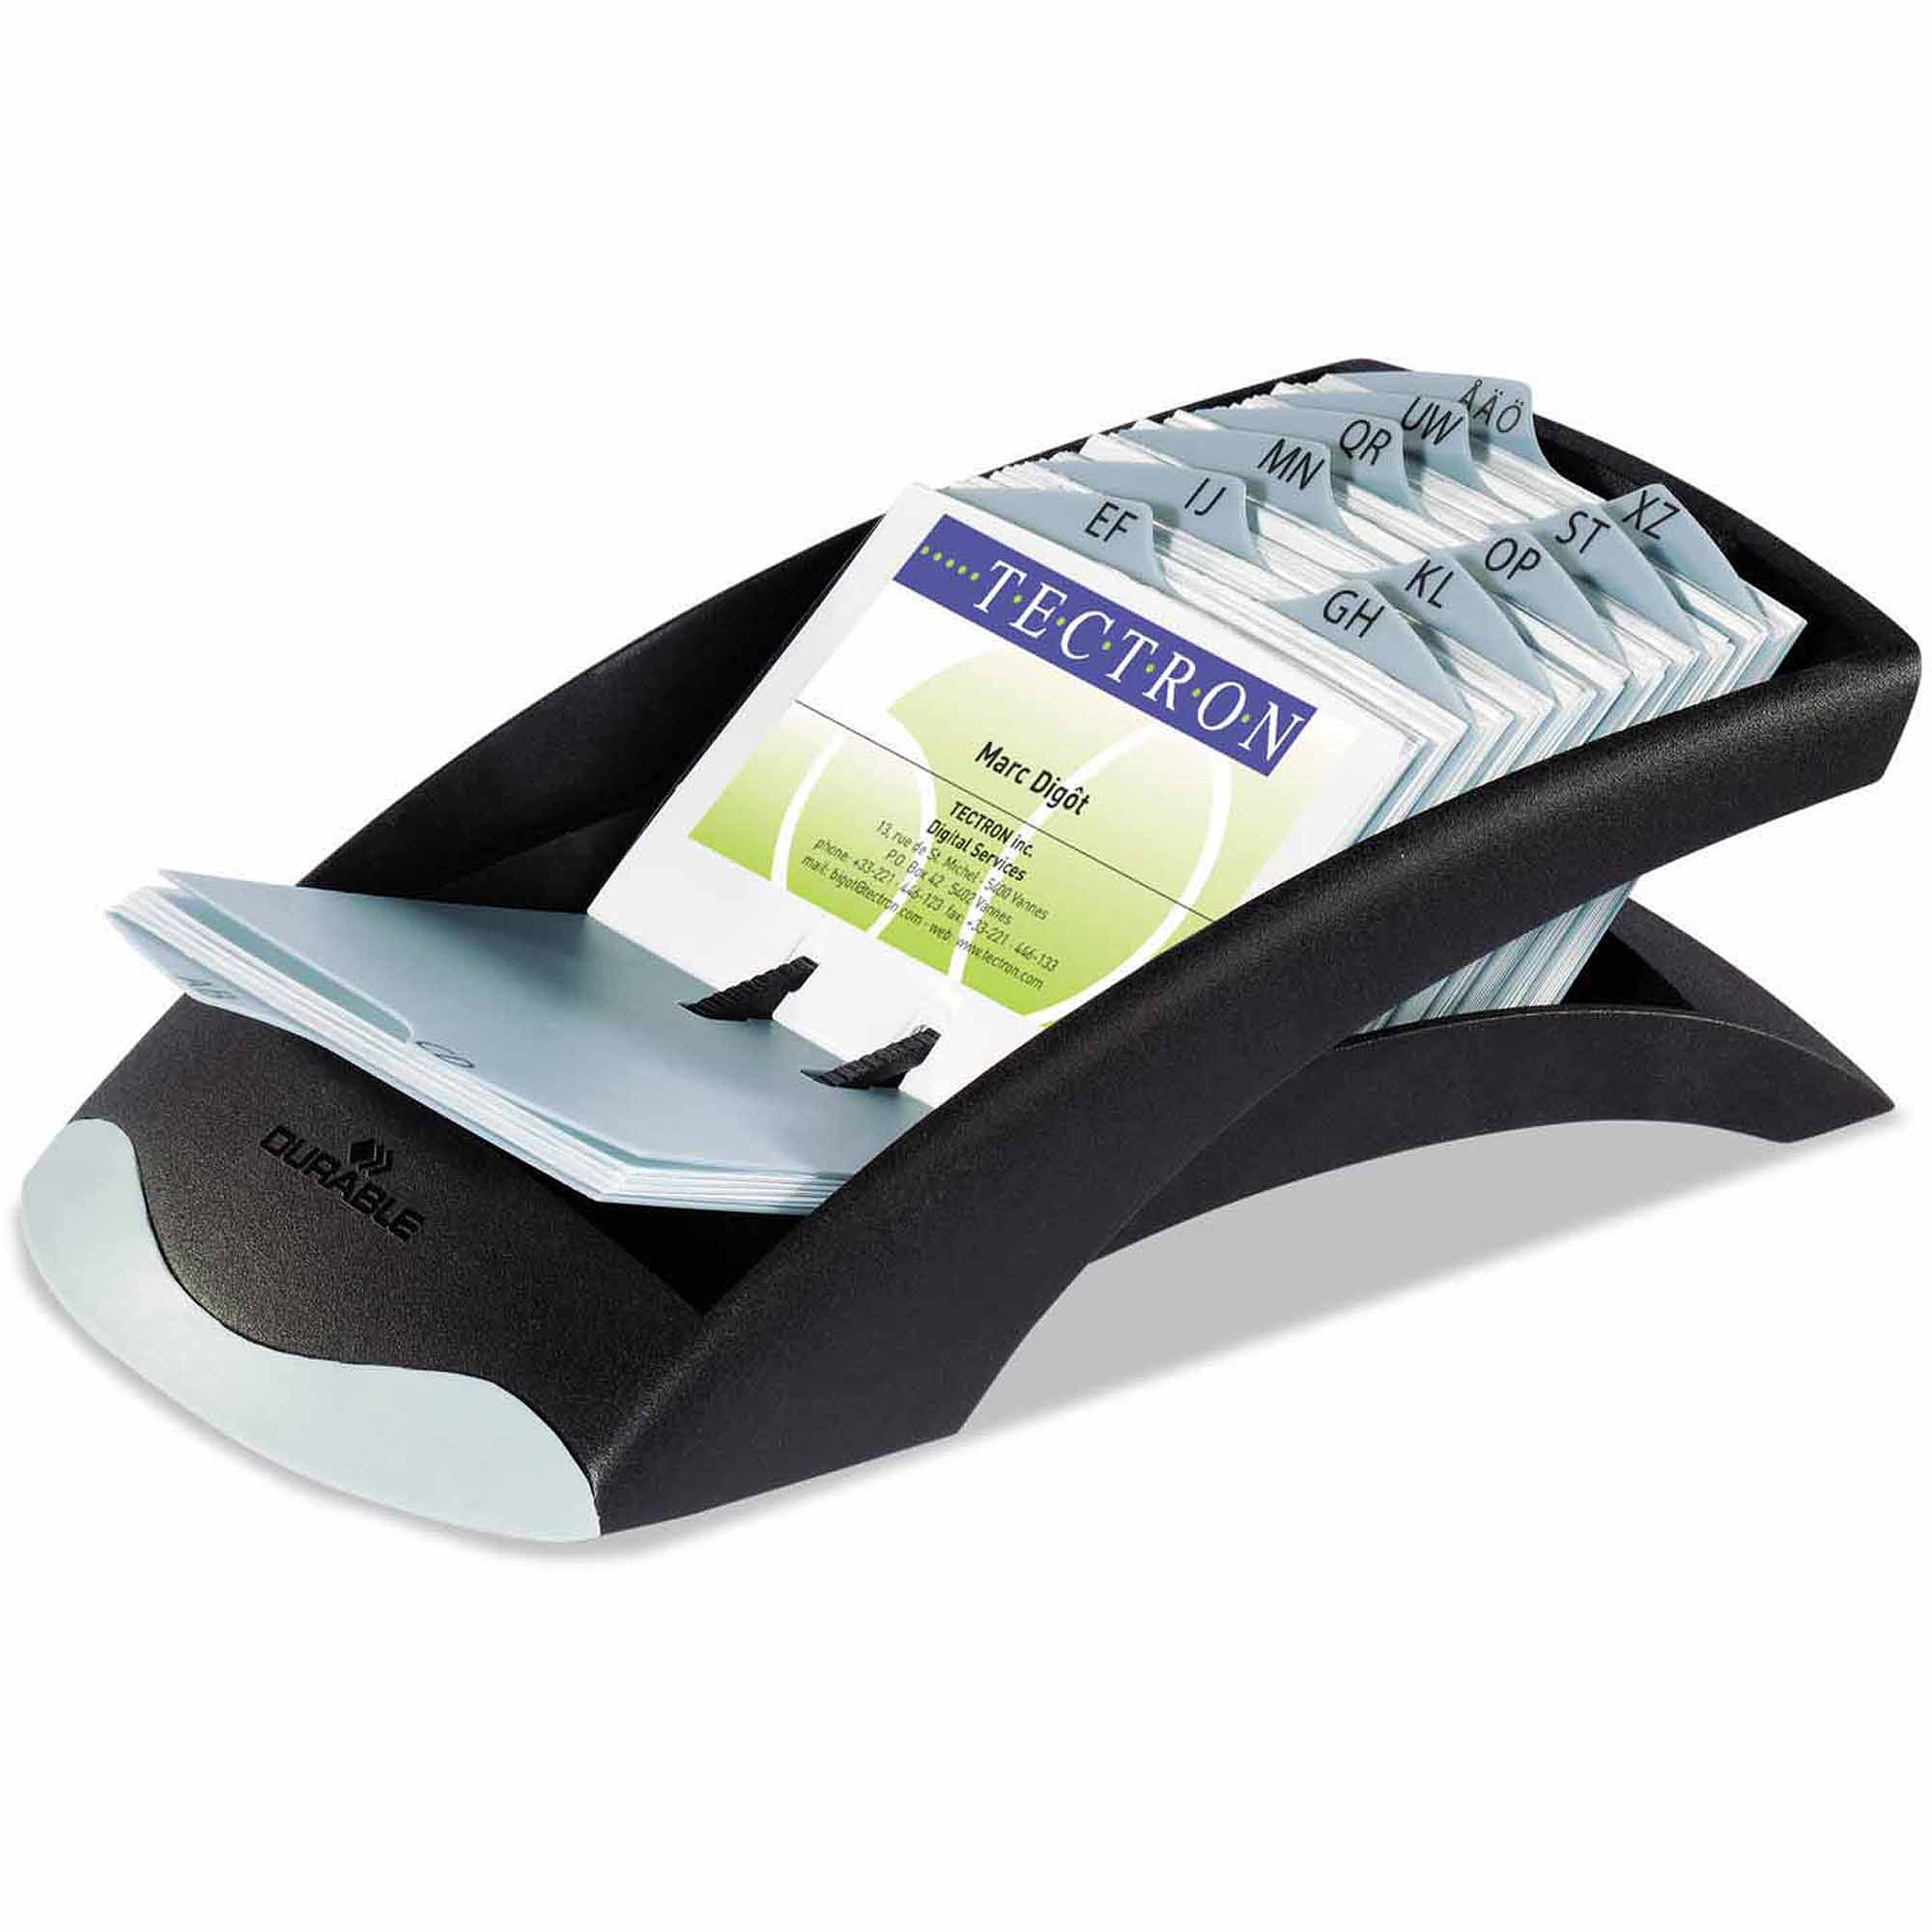 "Durable VISIFIX Desk Business Card File, Holds 200, 4-1/8"" x 2-7/8"" Cards, Graphite/Black"